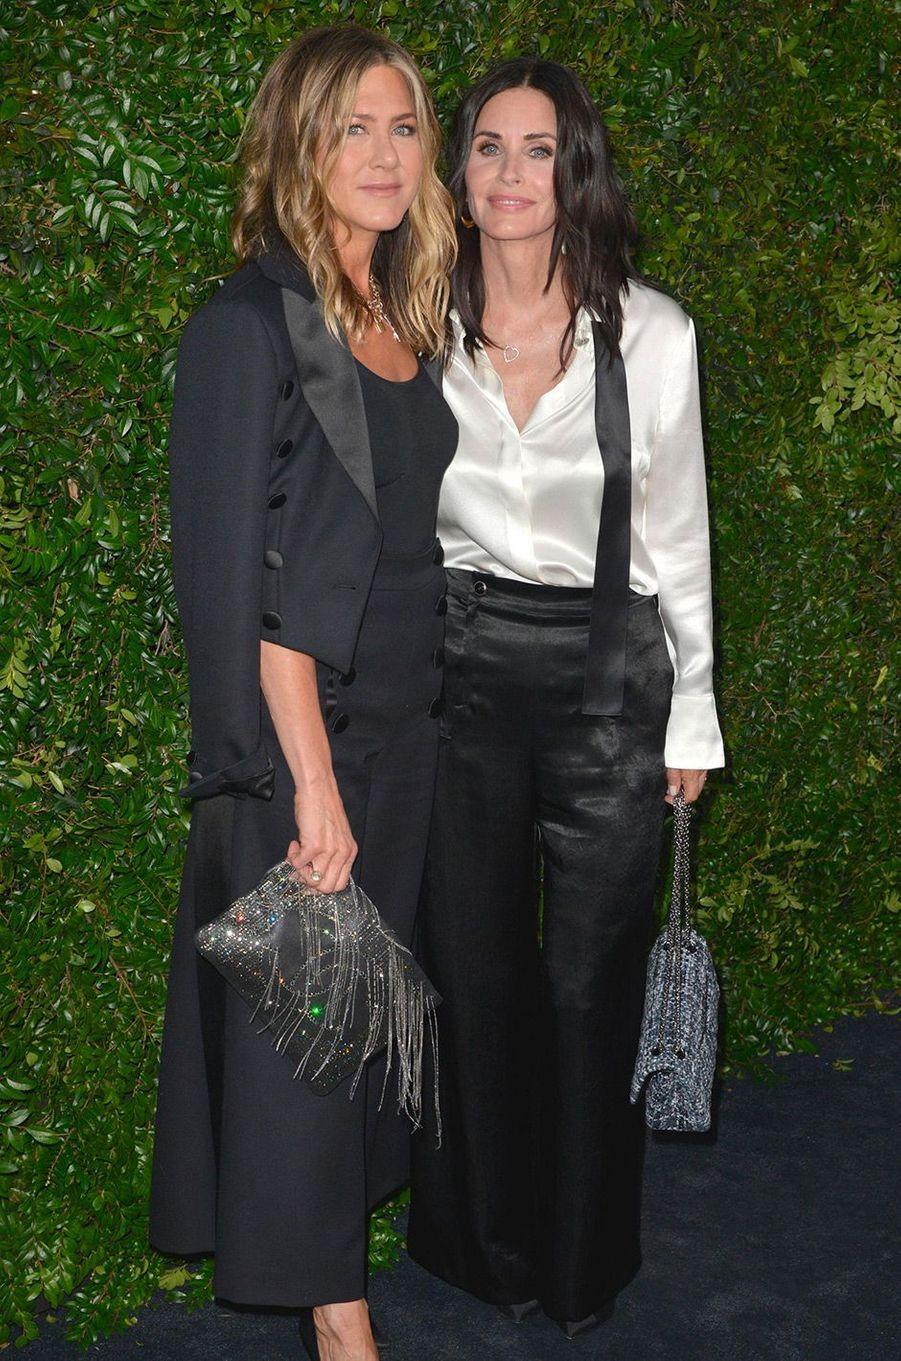 Jennifer Aniston et Courteney Cox à Los Angeles, samedi 2 juin